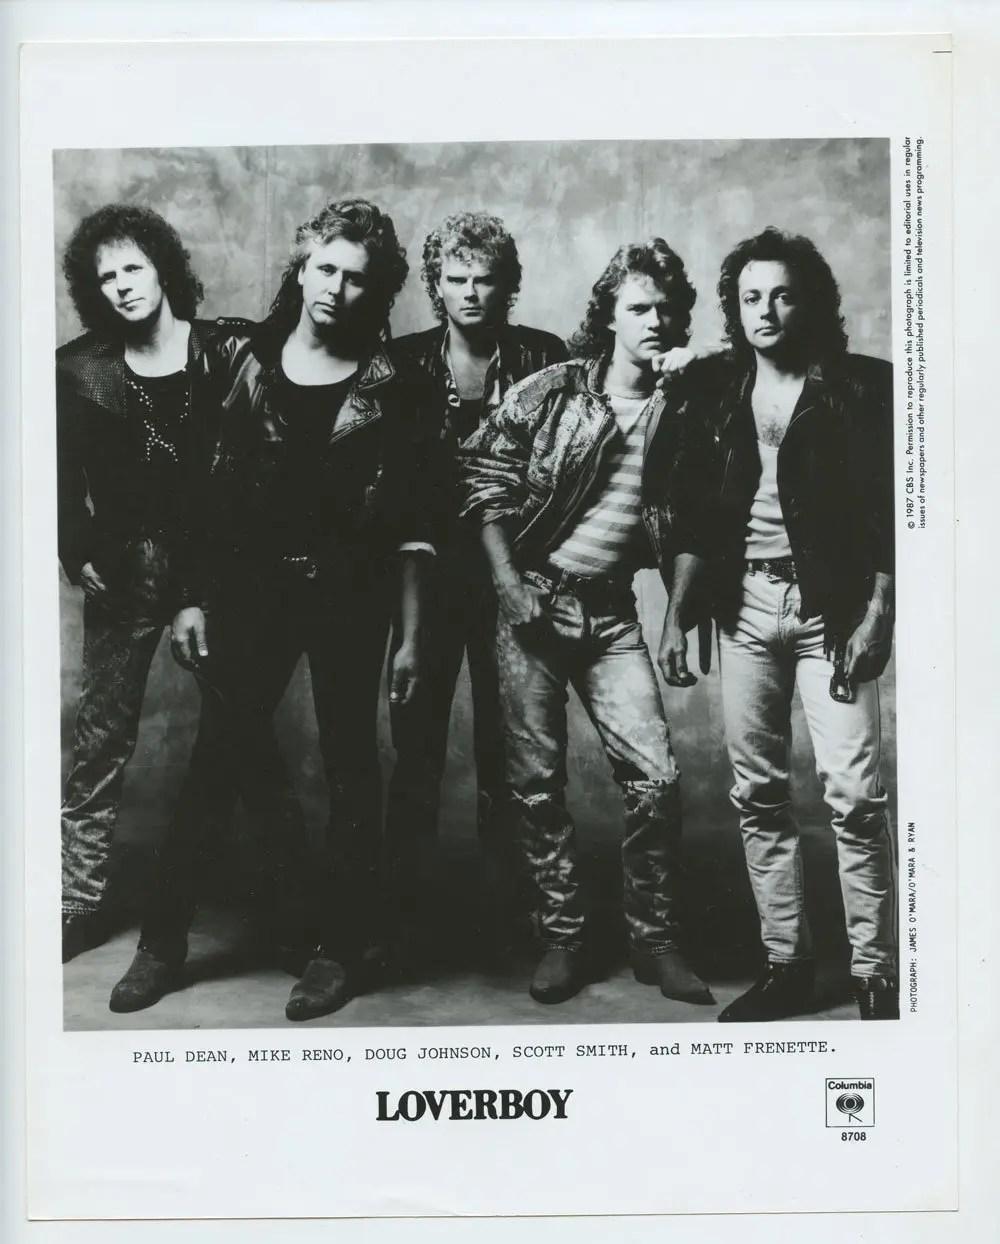 Loverboy Photo 1987 Publicity Promo CBS Records